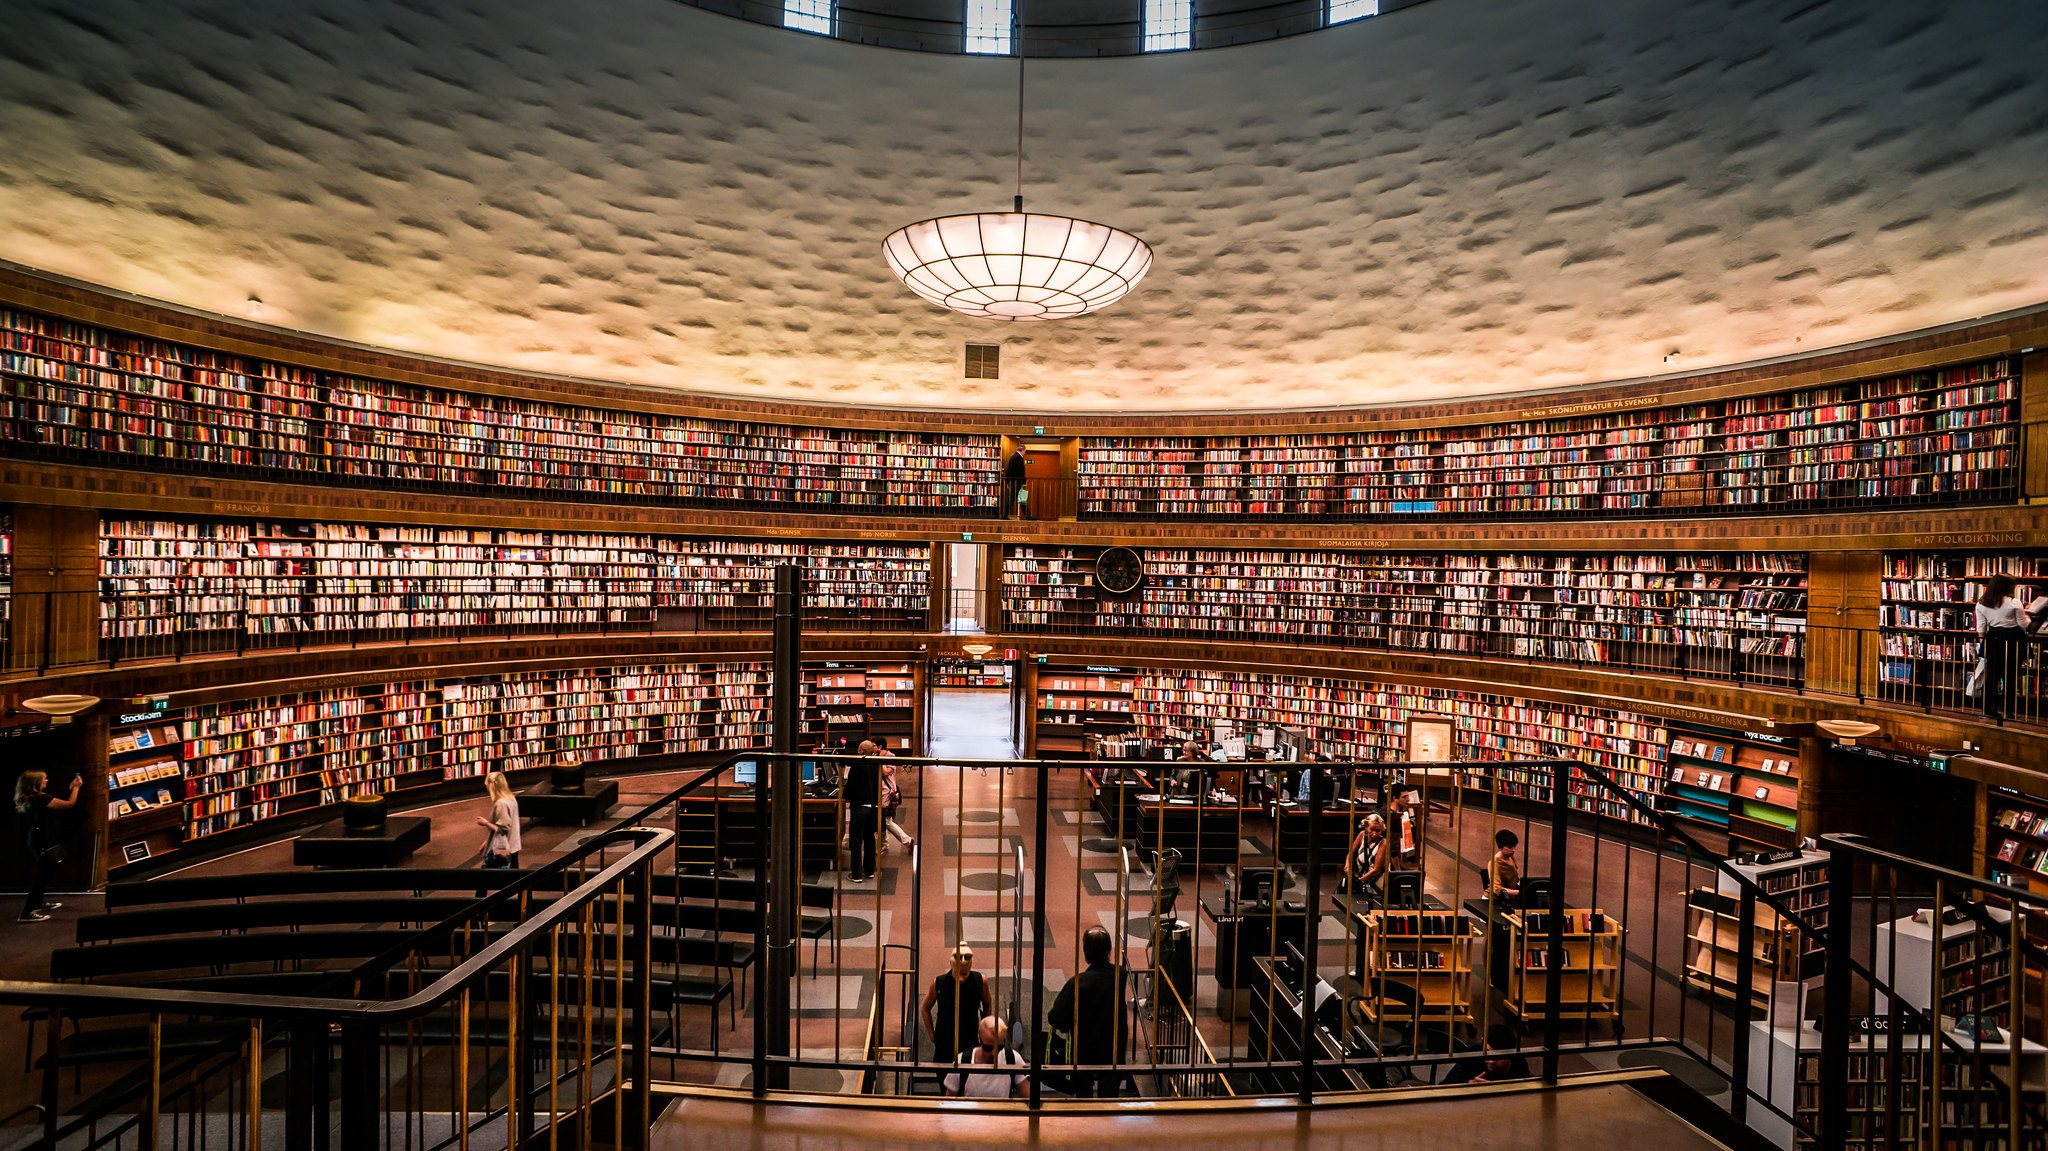 Stadsbiblioteket (Stockholm Public Library)